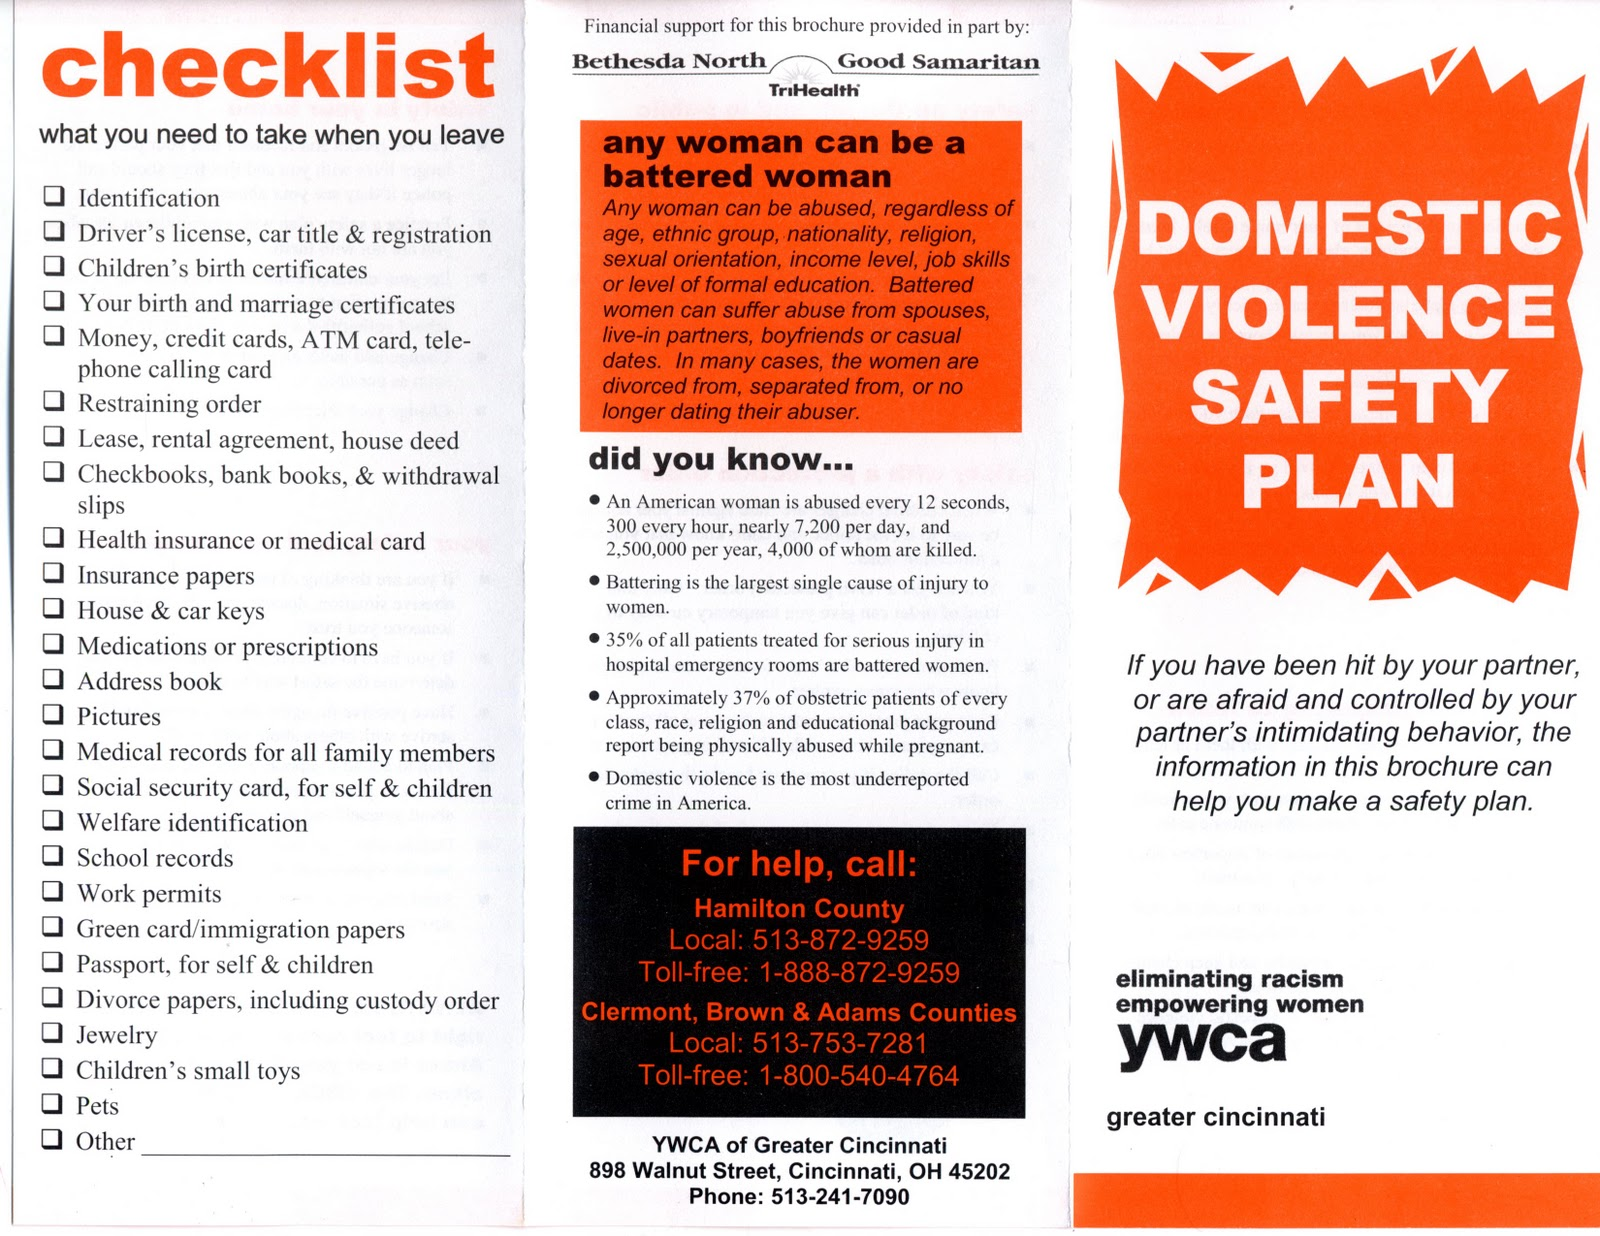 Worksheets Domestic Violence Safety Plan Worksheet reclaim at the university of cincinnati domestic violence safety plan ywca